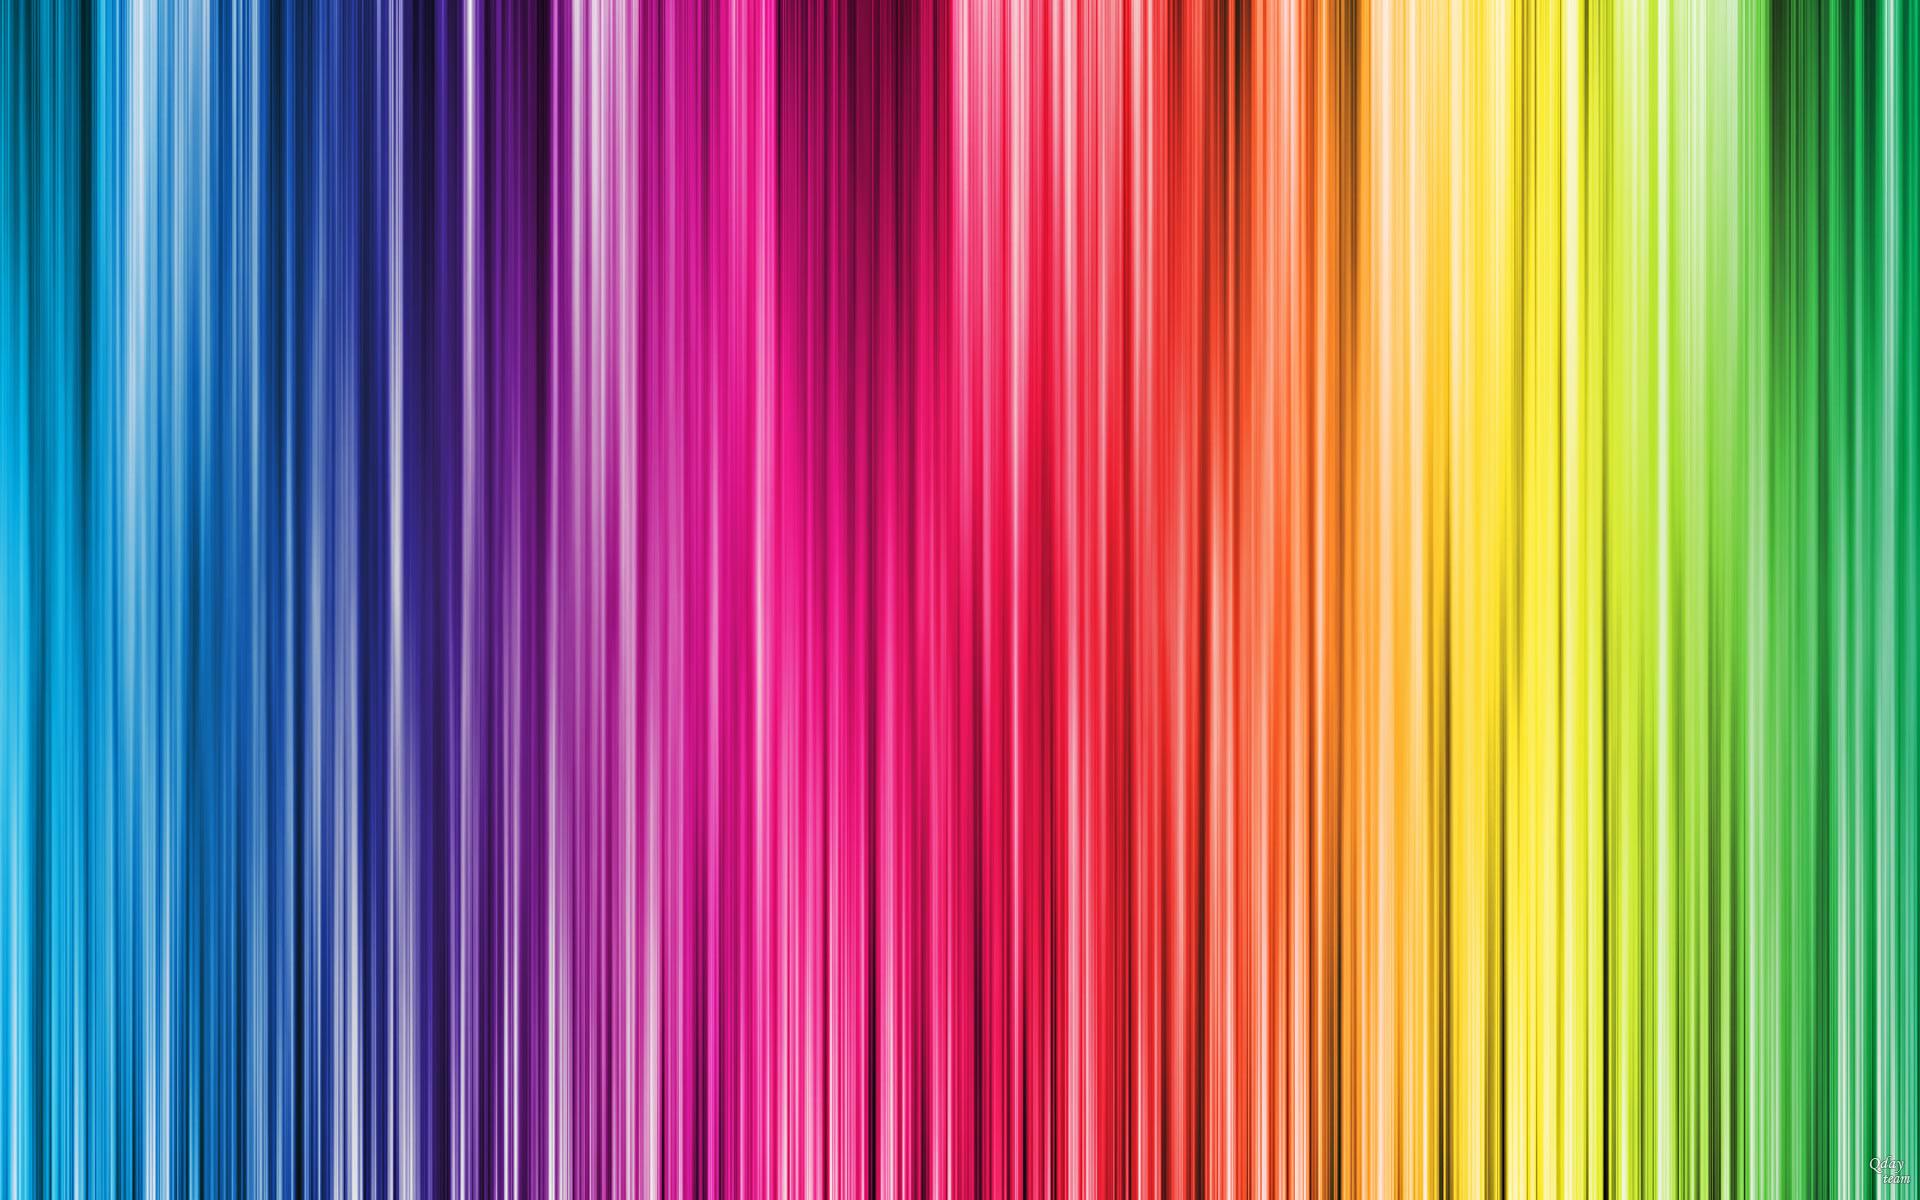 Arco Iris de Colores. Wallpapers de Colores